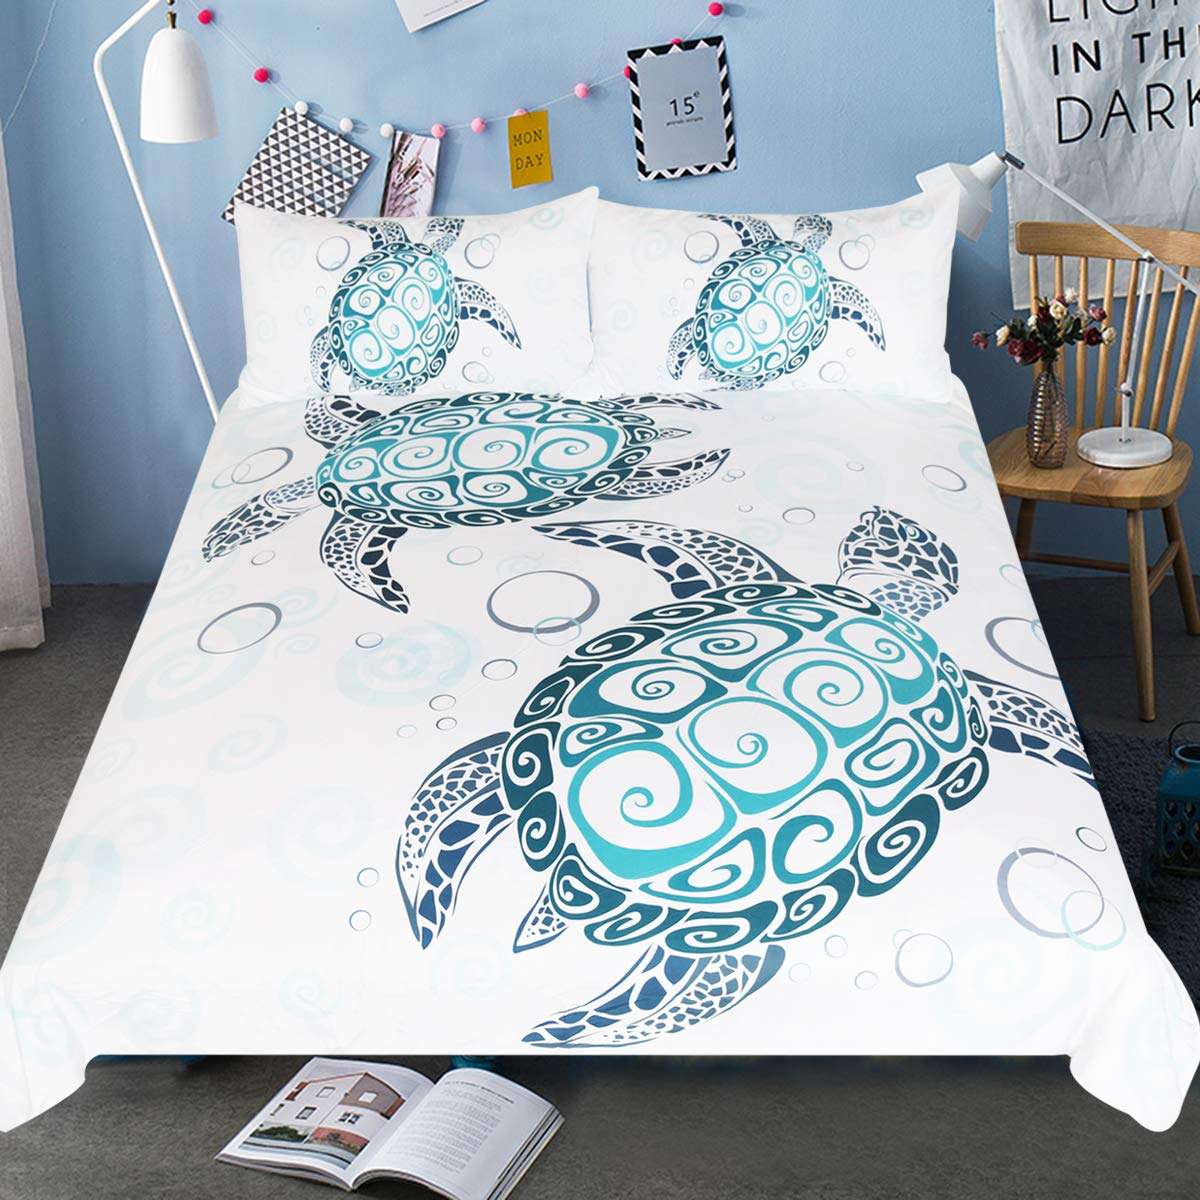 Sleepwish Turtle Bedding Royal Aqua Blue Turtles Duvet Cover 3 Piece Abstract Tortoise Bed Covers Underwater Children Bed Set (Queen)